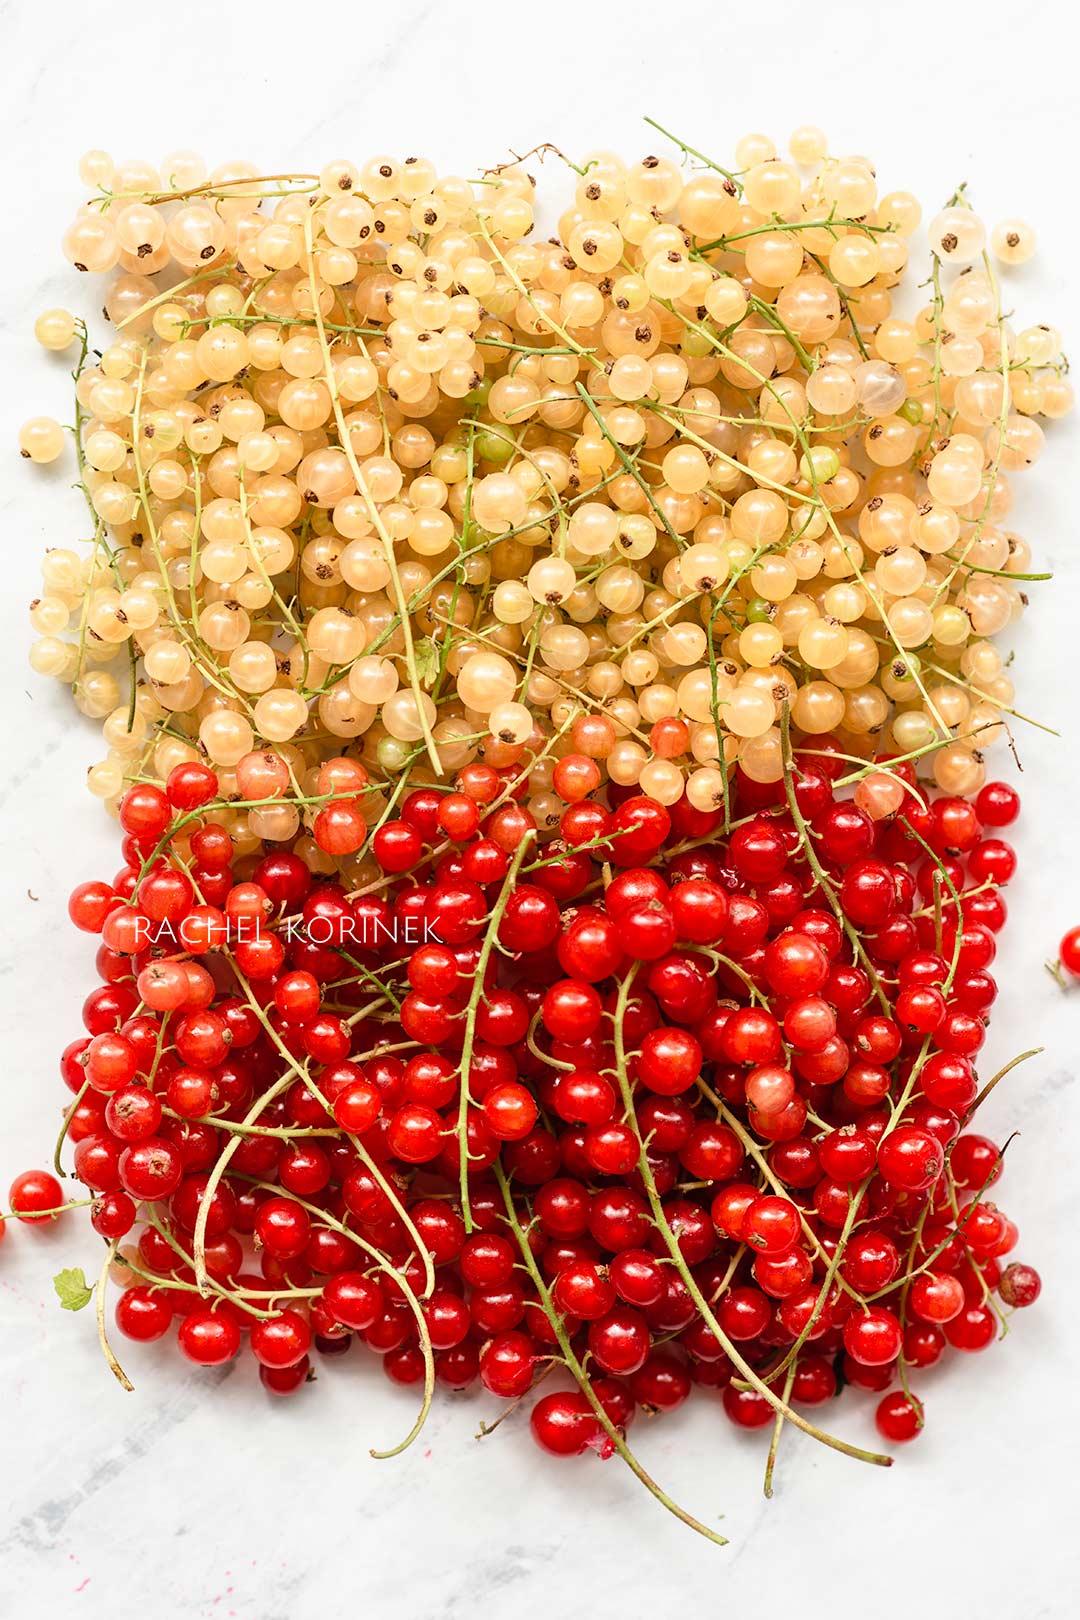 Rachel Korinek Food Photographer | Red White Currants